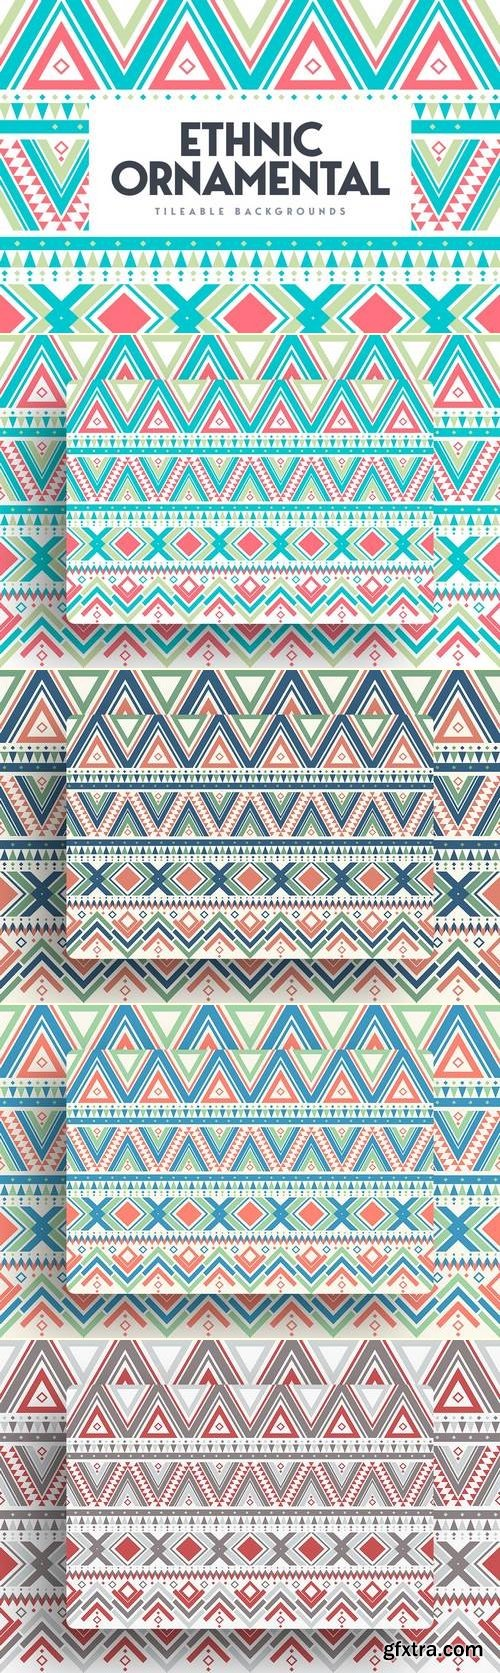 Ethnic Ornamental Tileable Backgrounds